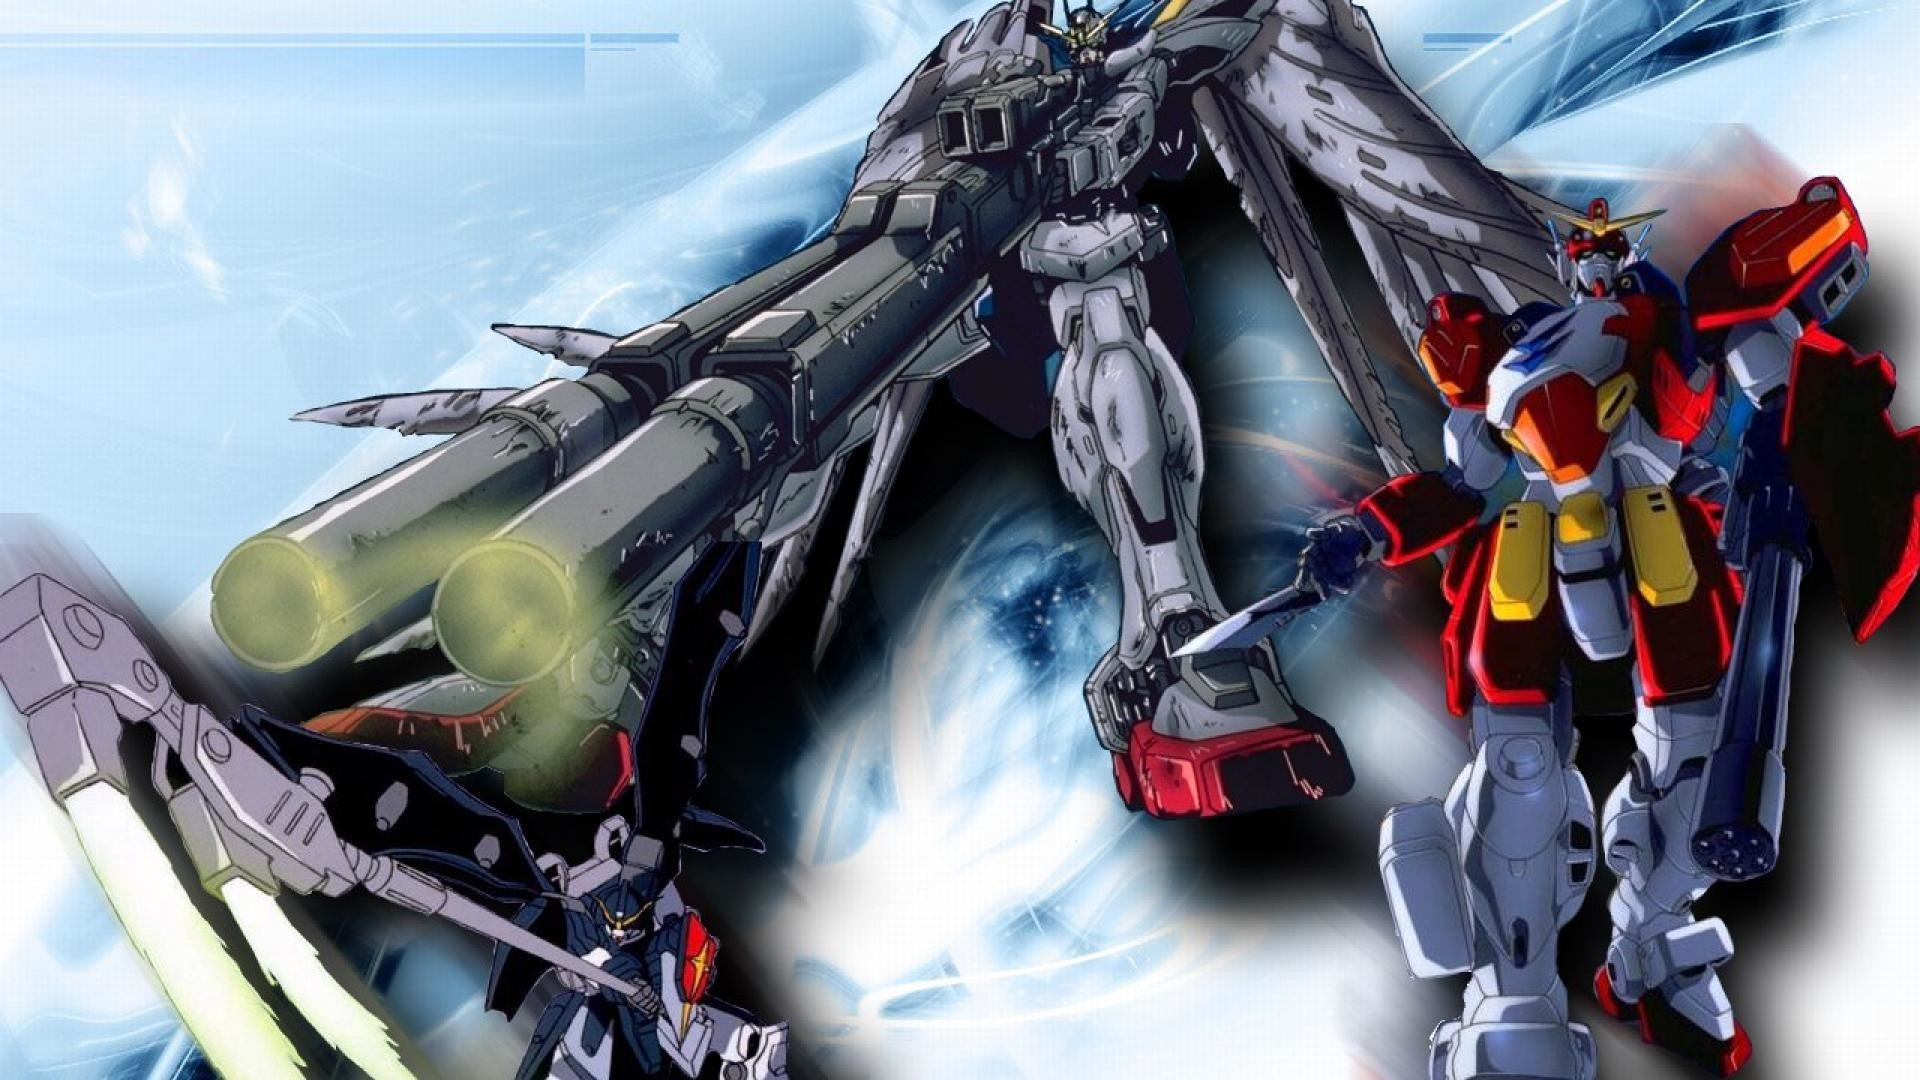 … Gundam Wing Wallpaper Hd5 600×338. Download